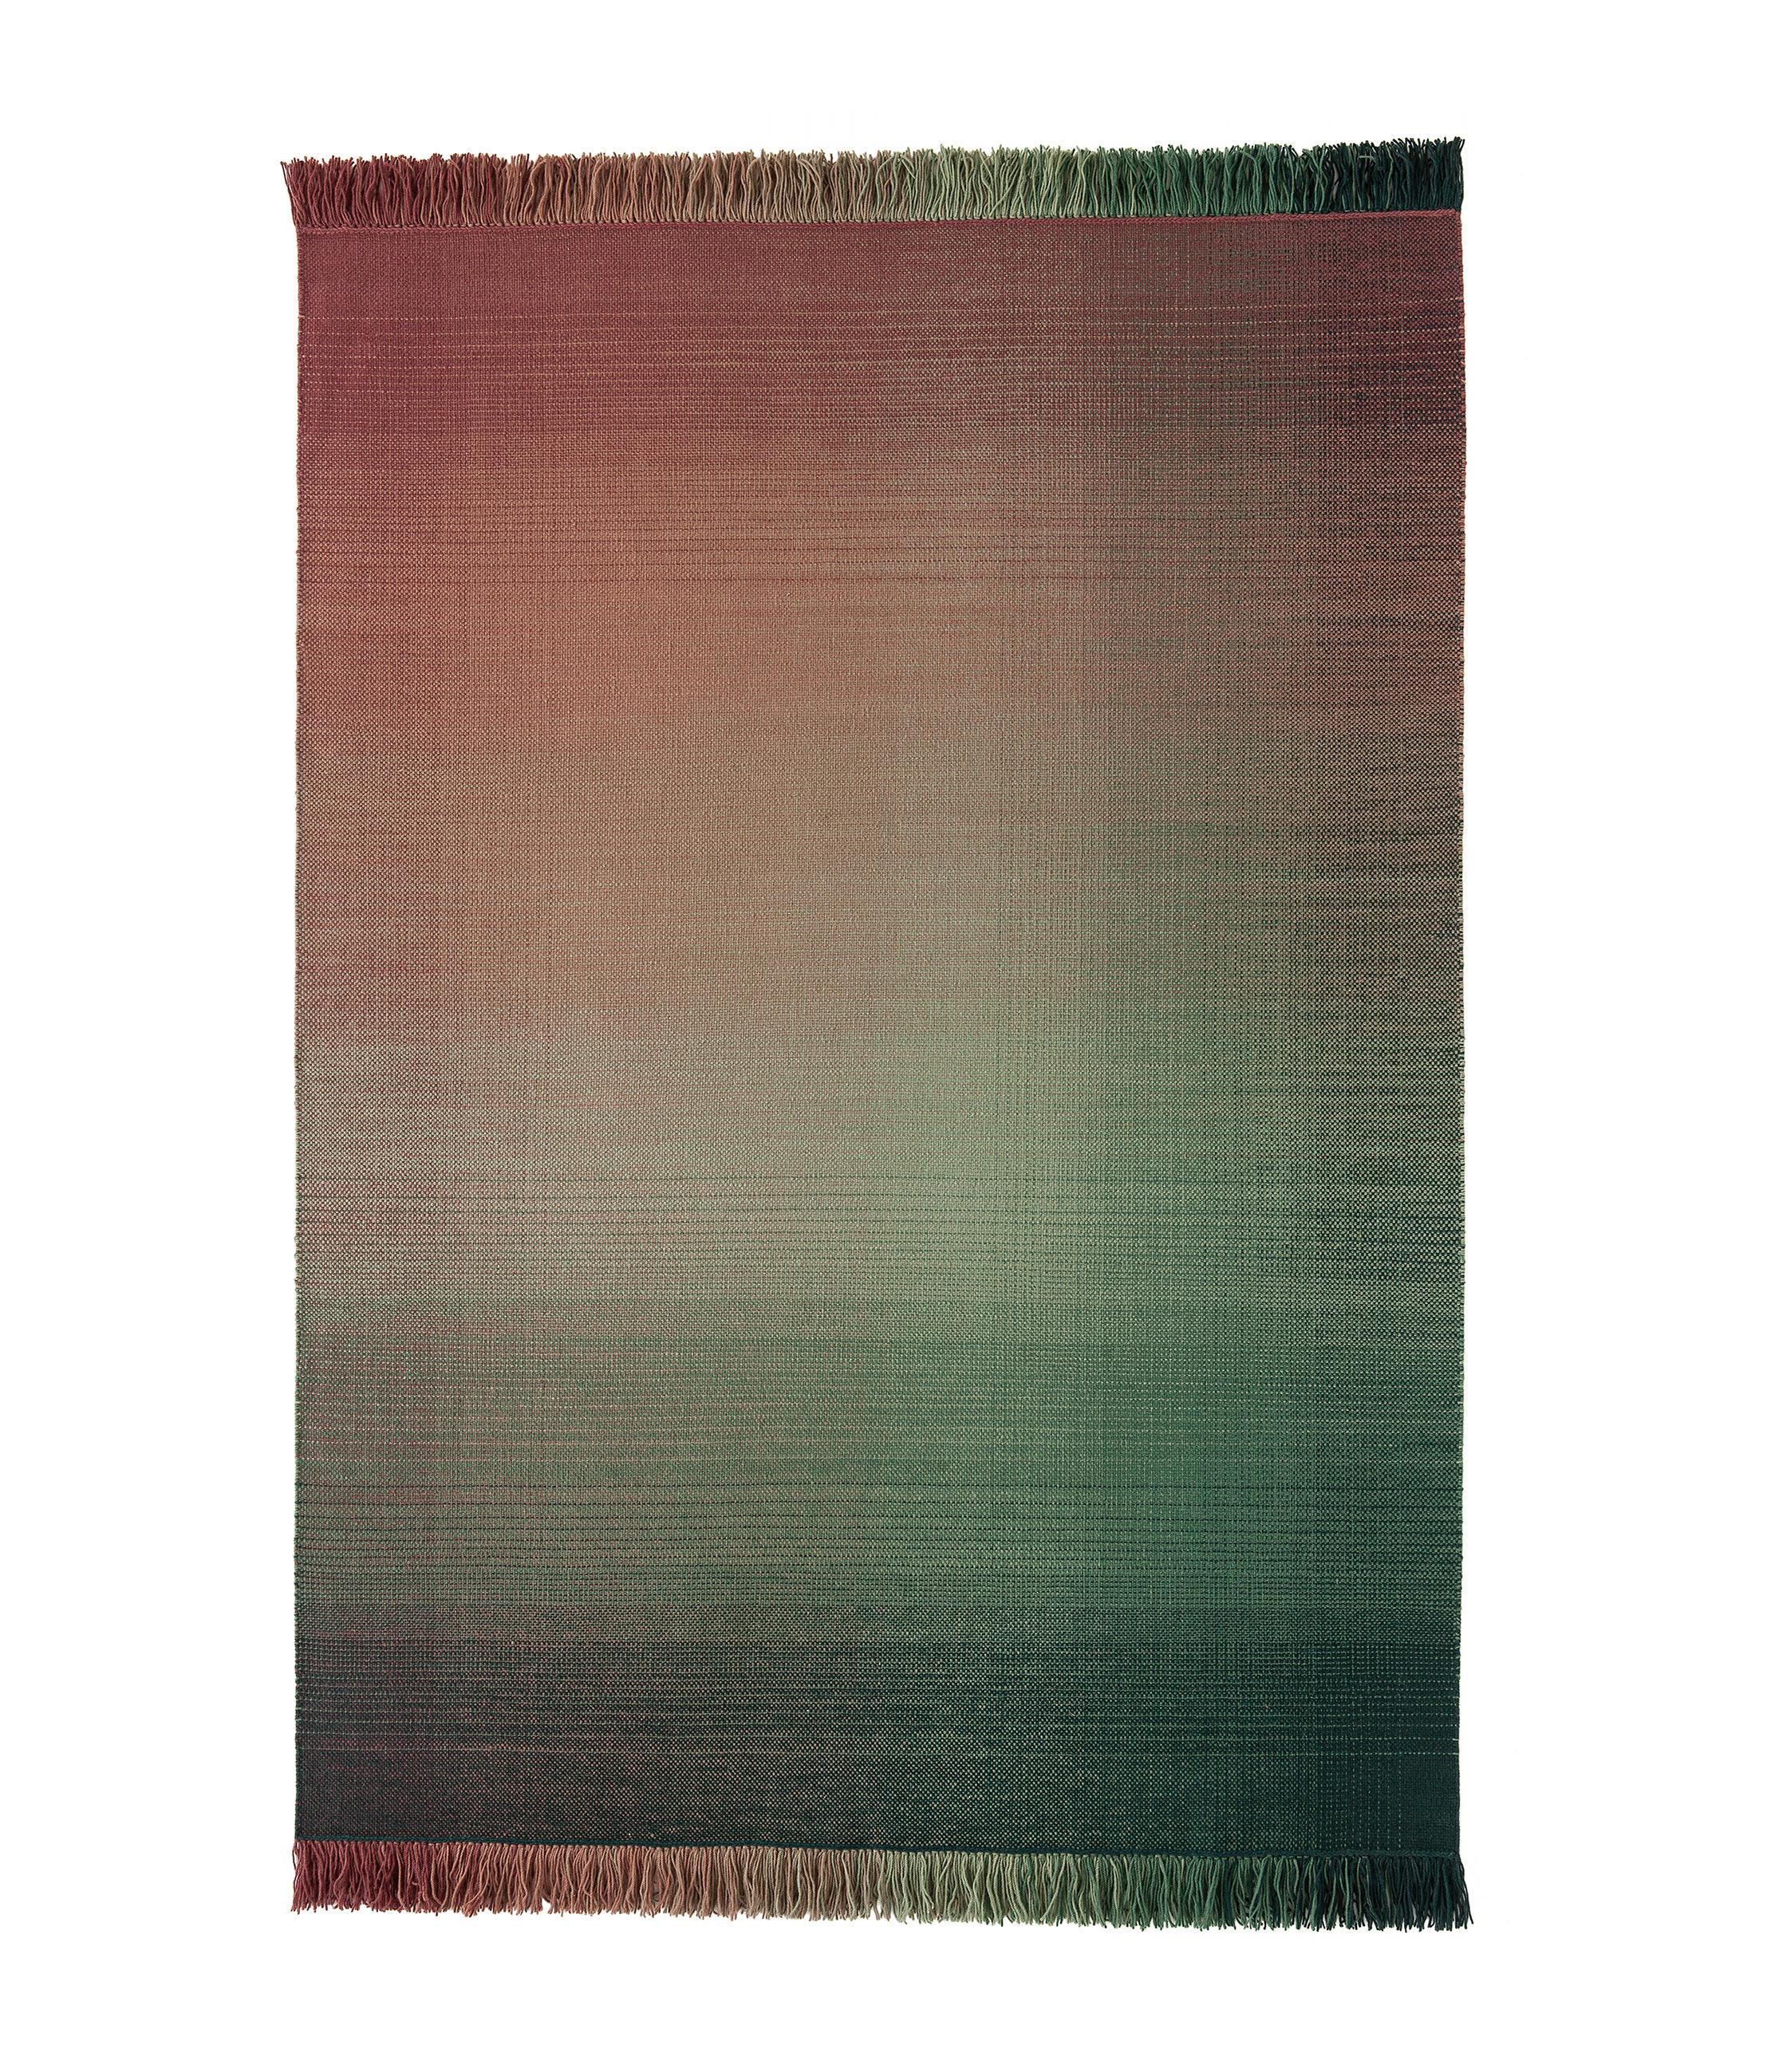 shade palette 3 formatteppiche designerteppiche von nanimarquina architonic. Black Bedroom Furniture Sets. Home Design Ideas